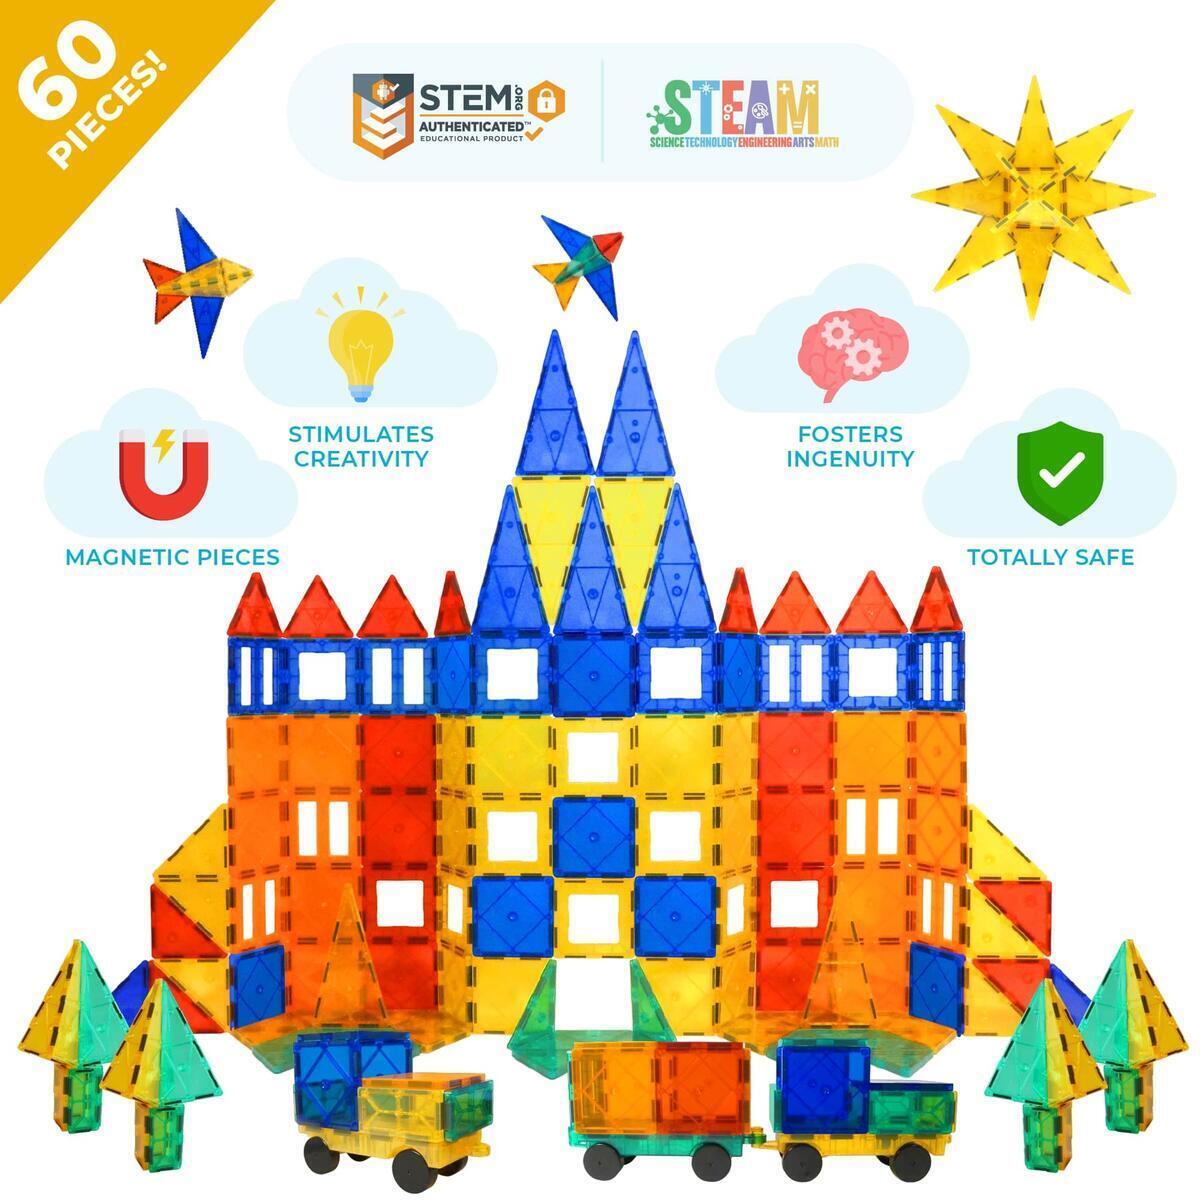 Tytan Magnetic Tiles & Building Toys - STEM Certified Blocks, Magnets for Kids/Boys/Girls Fun, Creative, Educational - 60 Piece Set